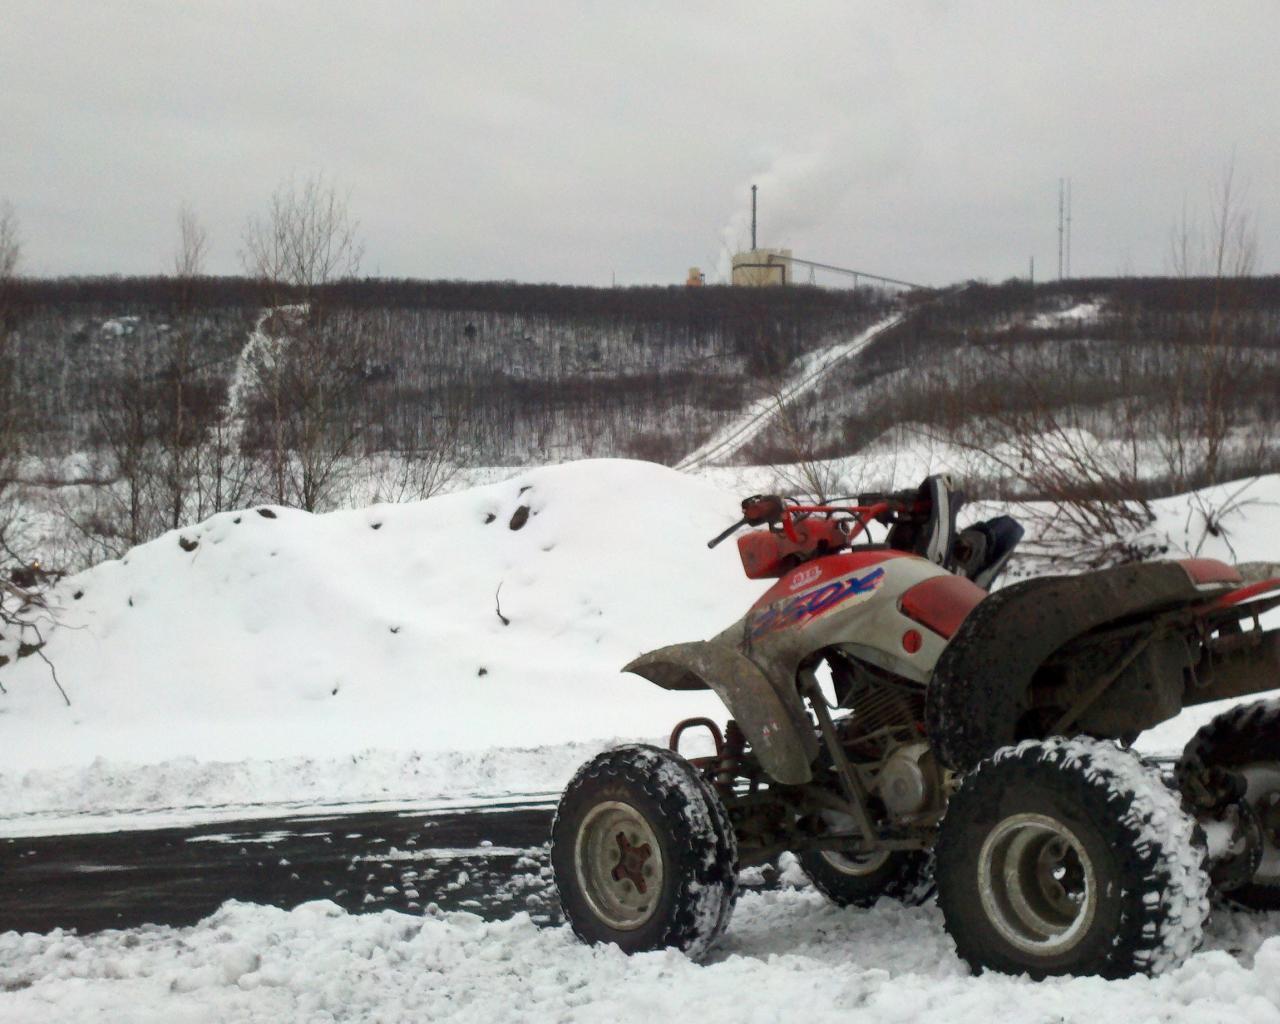 Landscapes snow honda quad bike four wheeler wallpaper 38932 1280x1024